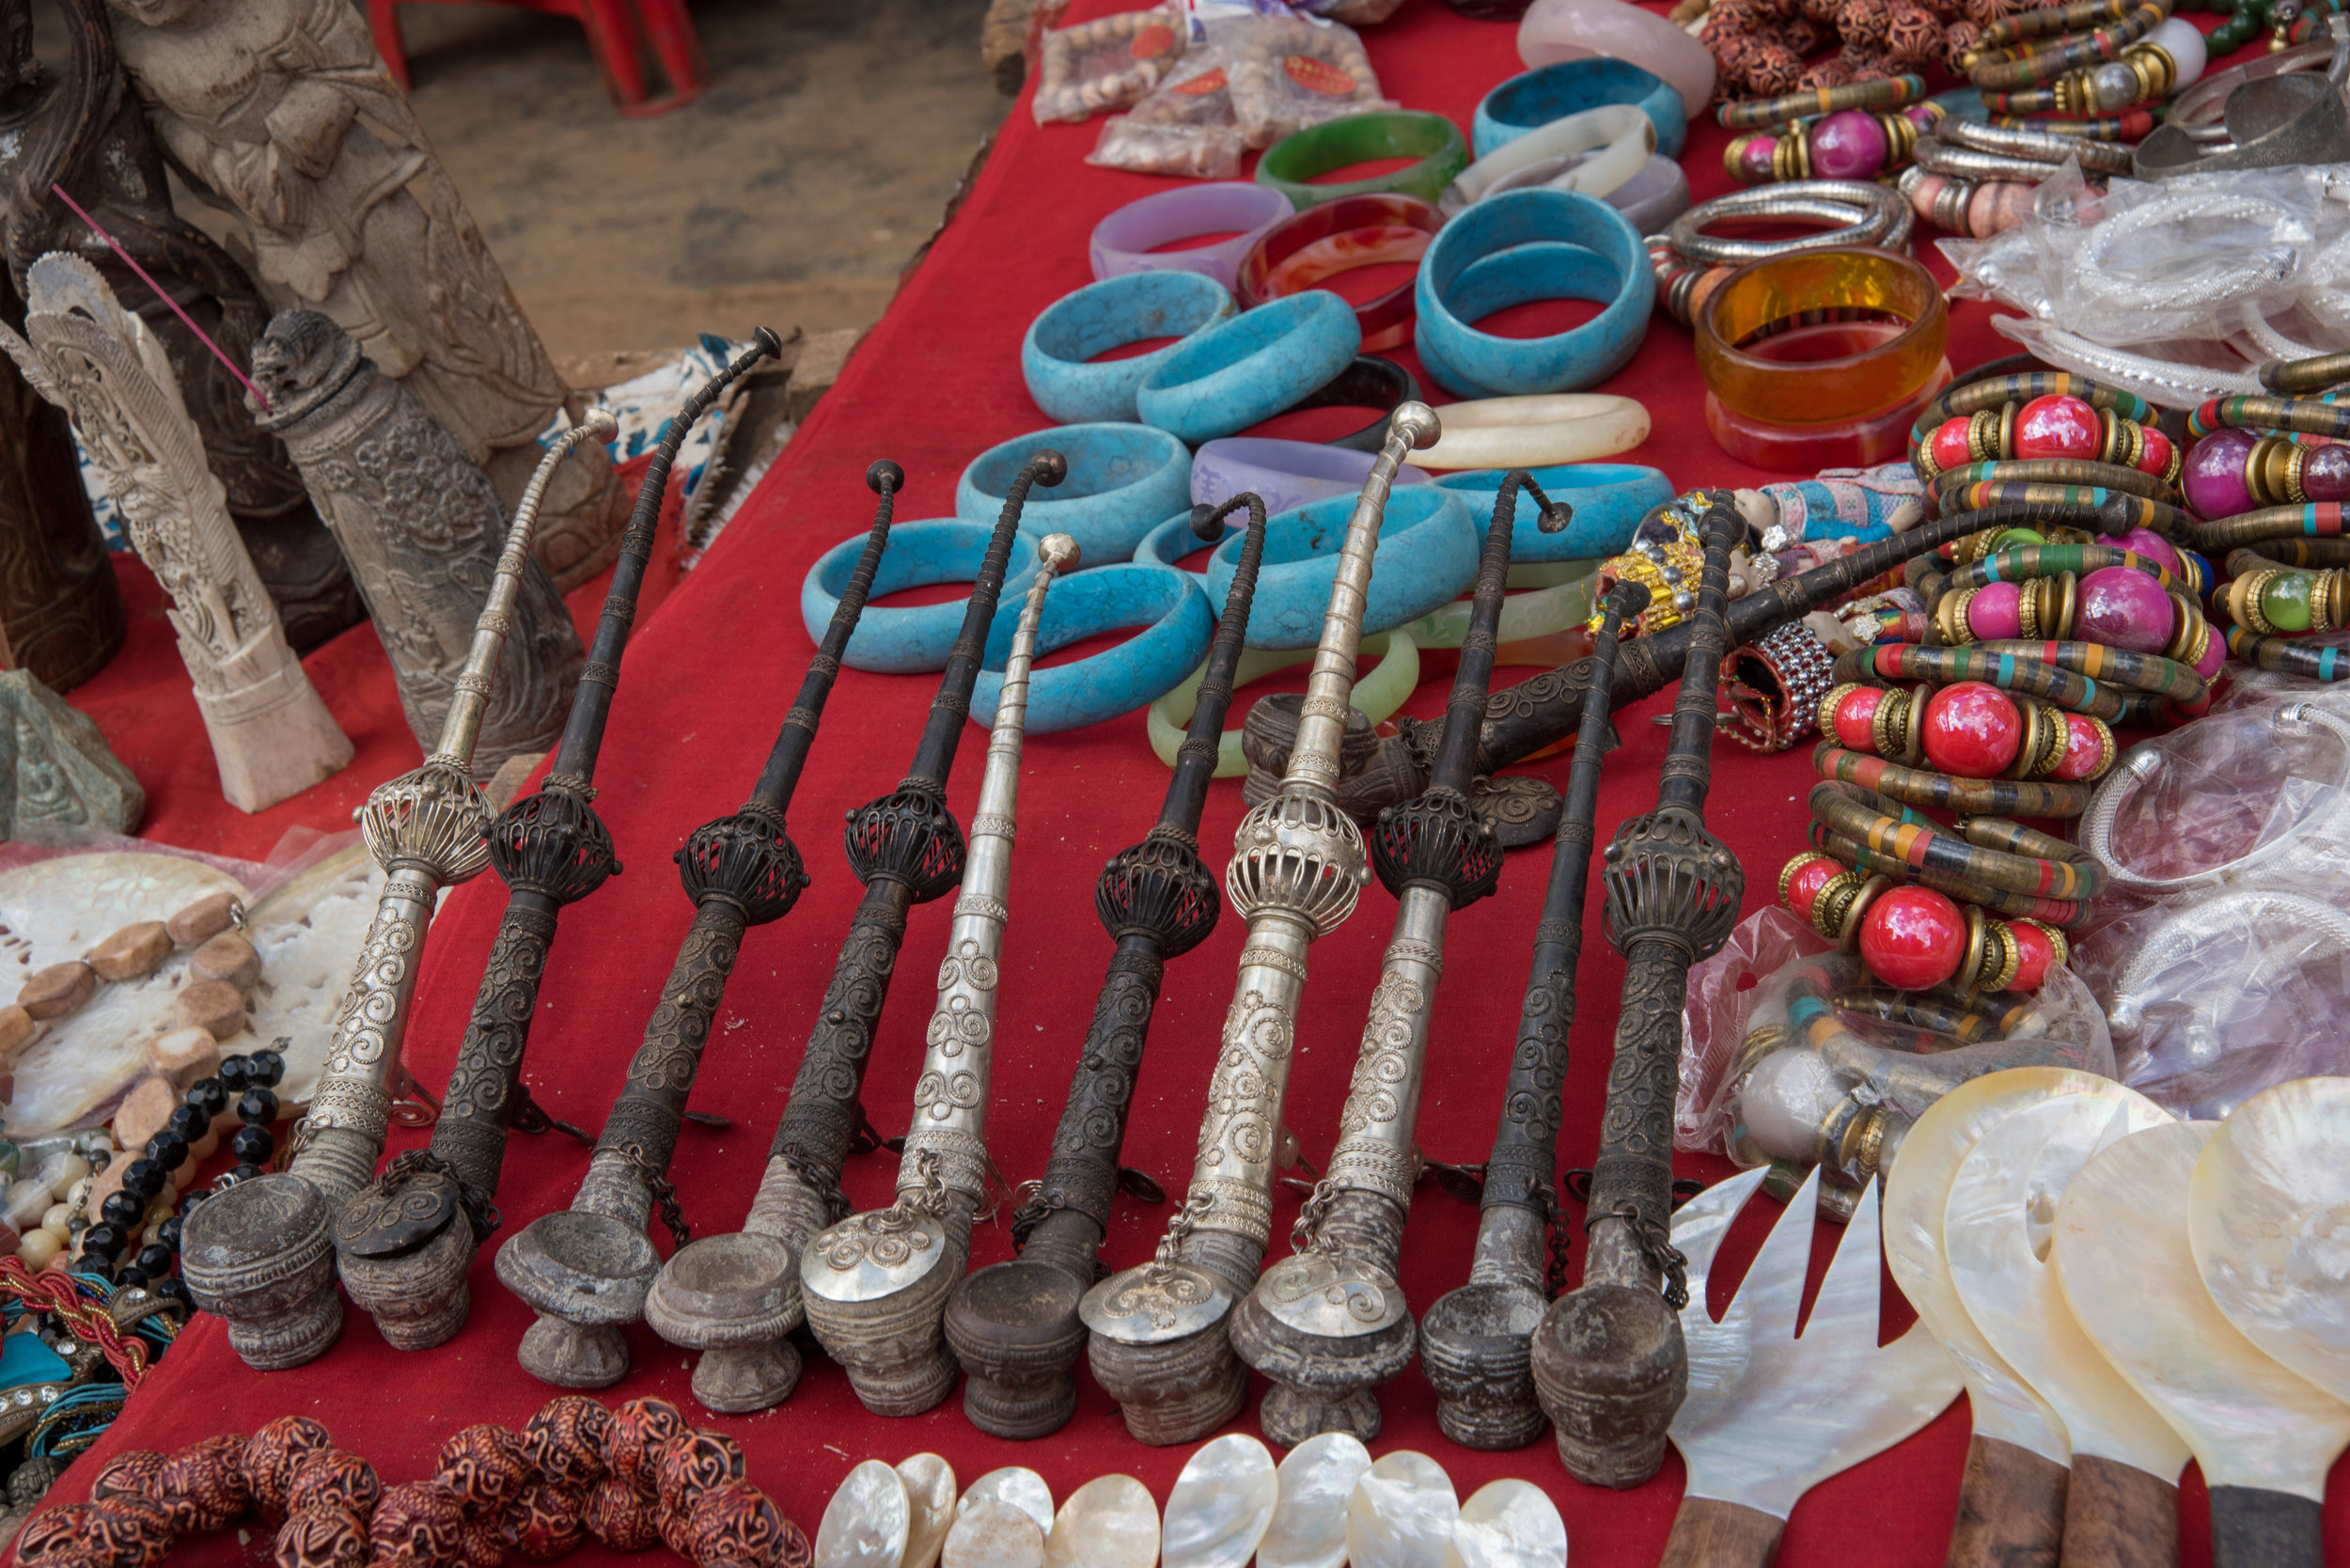 Pipes at HeHo market, Myanmar